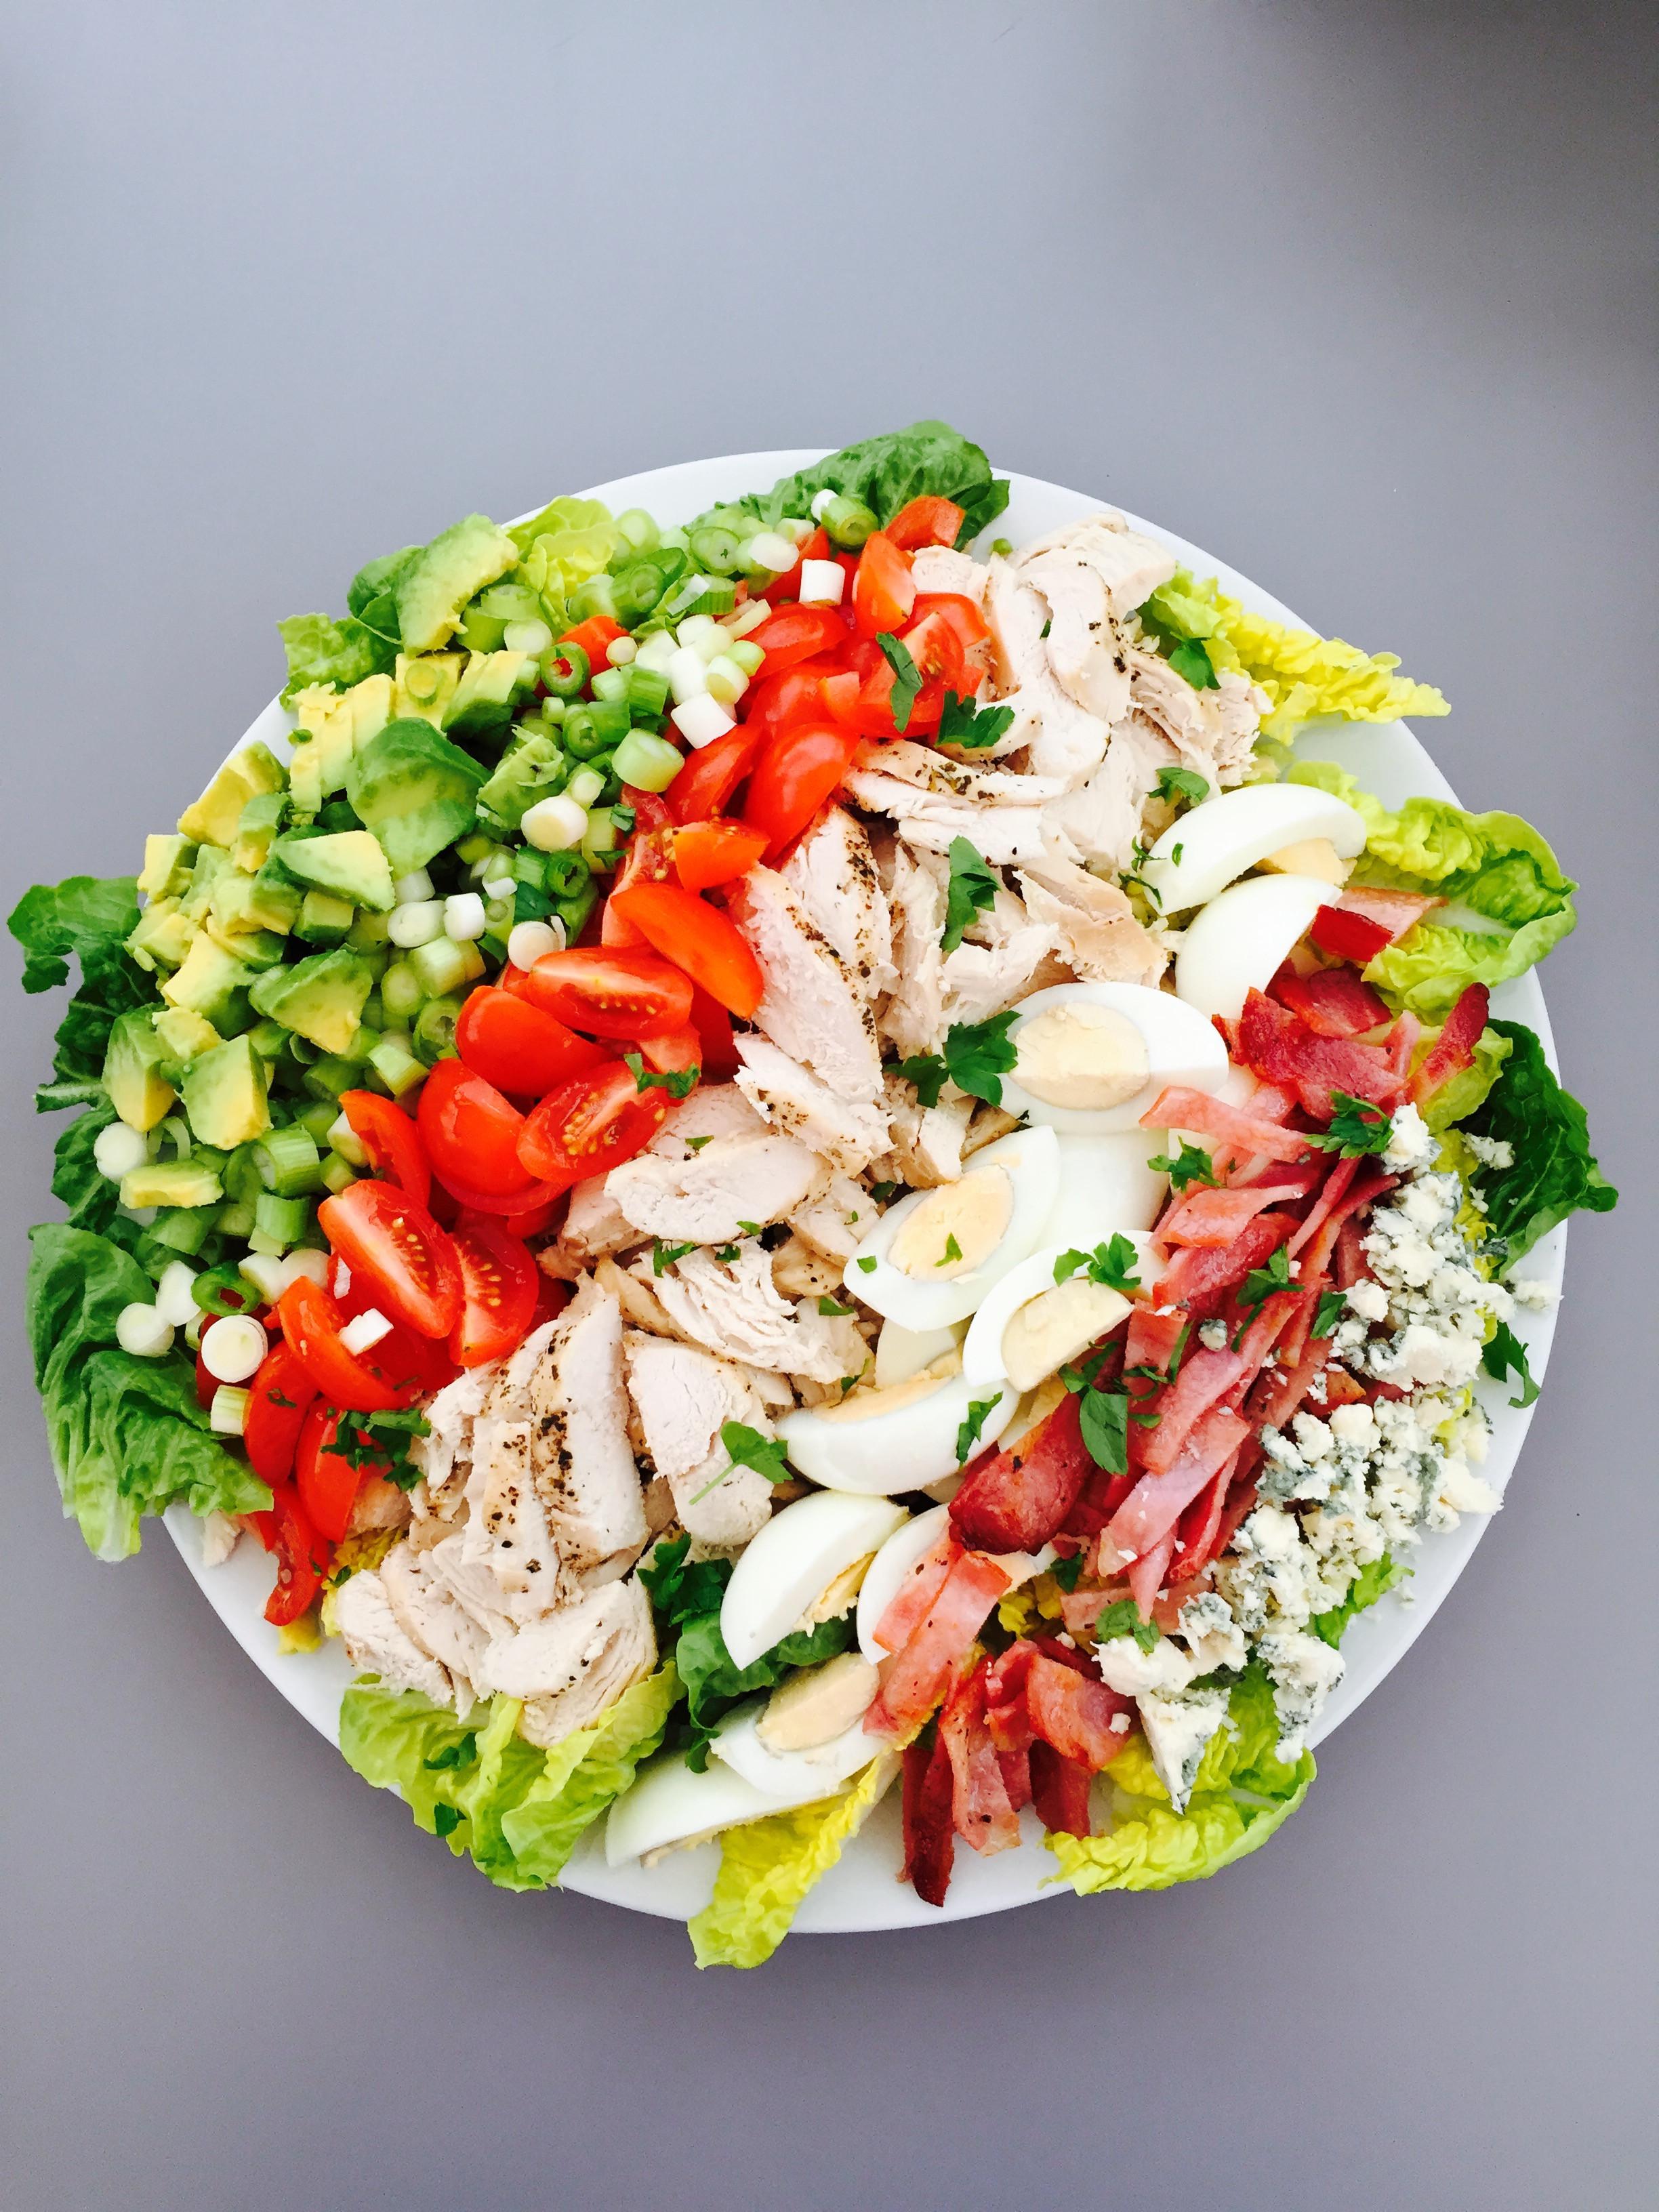 Delicious Healthy Salads  Delicious healthy salads